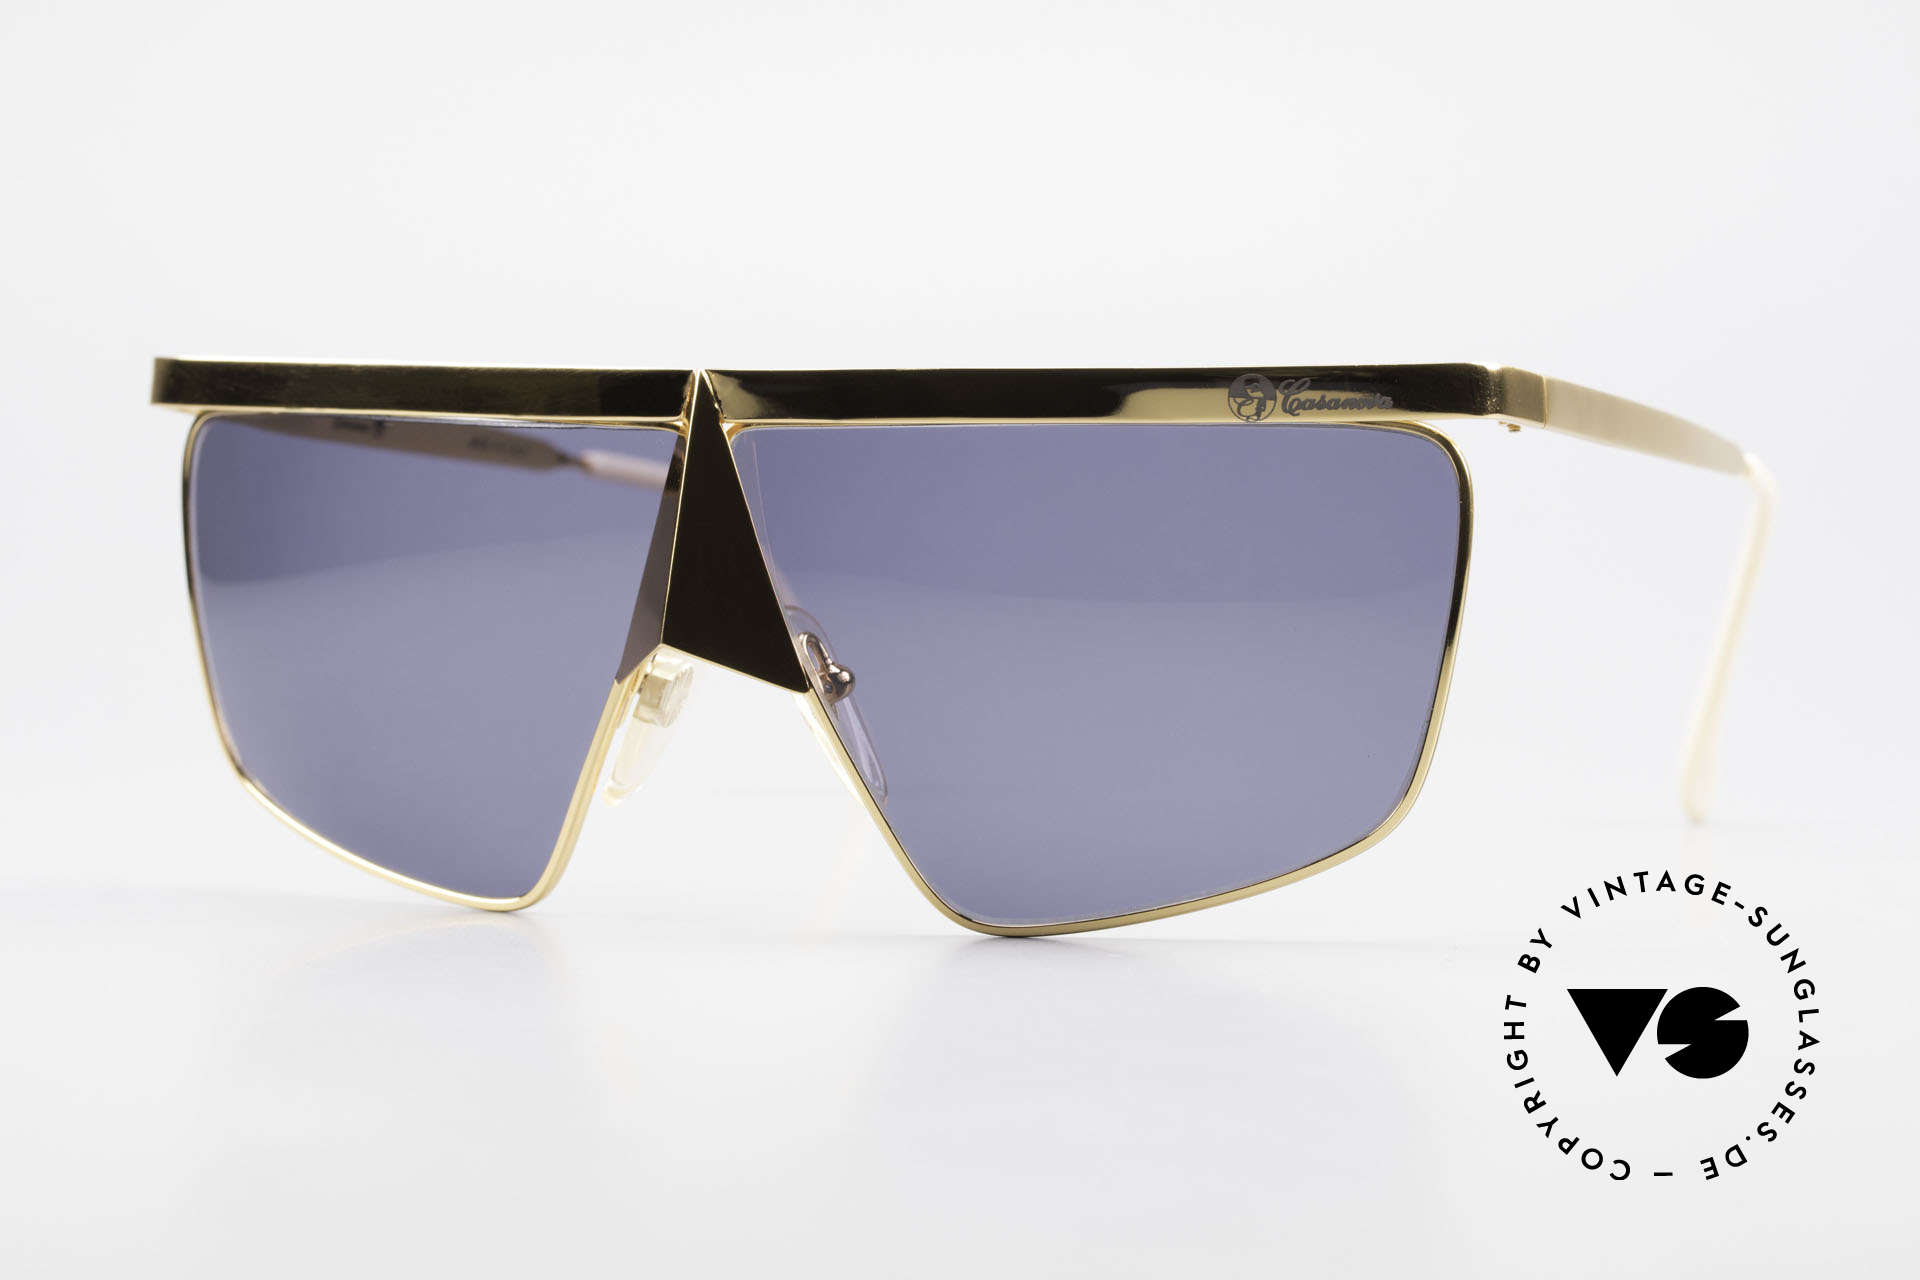 Casanova FC10 Noseguard Sunglasses 24kt, interesting Casanova 'nose sunglasses' from app. 1985, Made for Men and Women